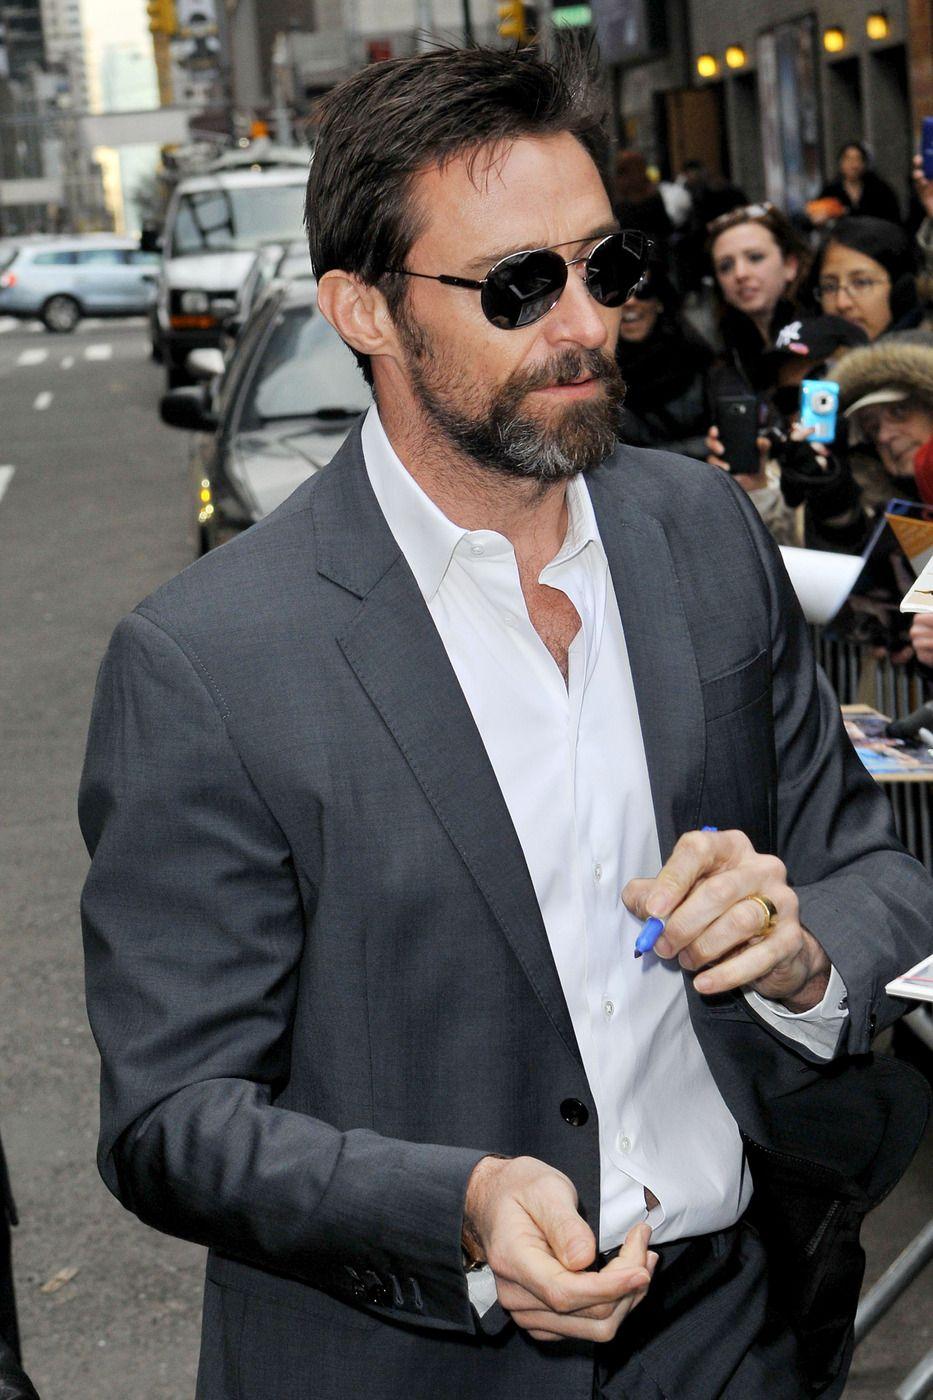 Hugh Jackman Is Getting Ready For His 2013 Oscar Appearance Or Acceptance! (Photos)